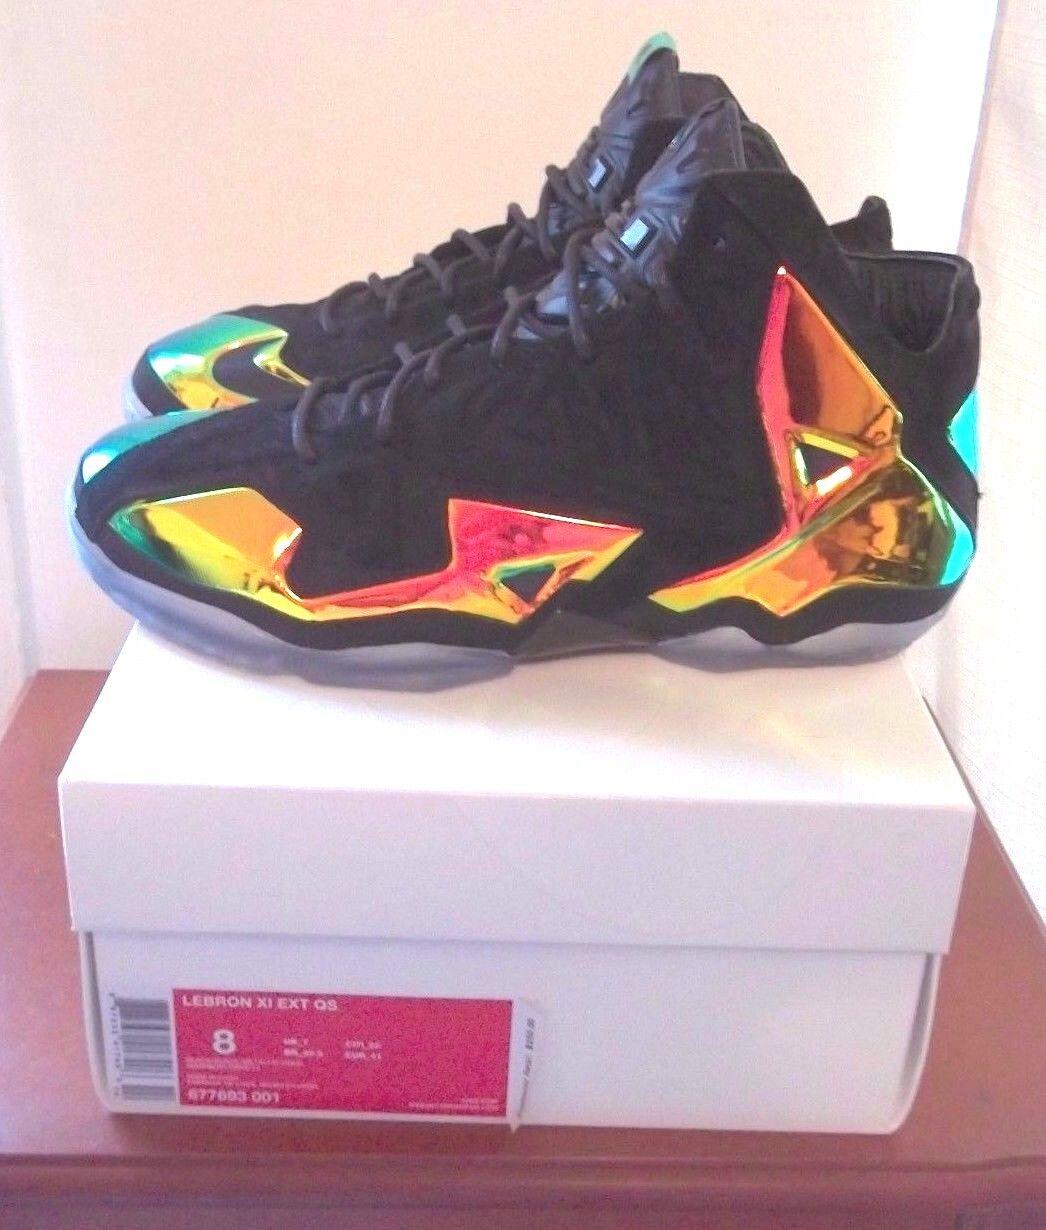 NEW Nike Lebron XI 11 EXT QS Kings Crown Jewel Comfortable Seasonal price cuts, discount benefits